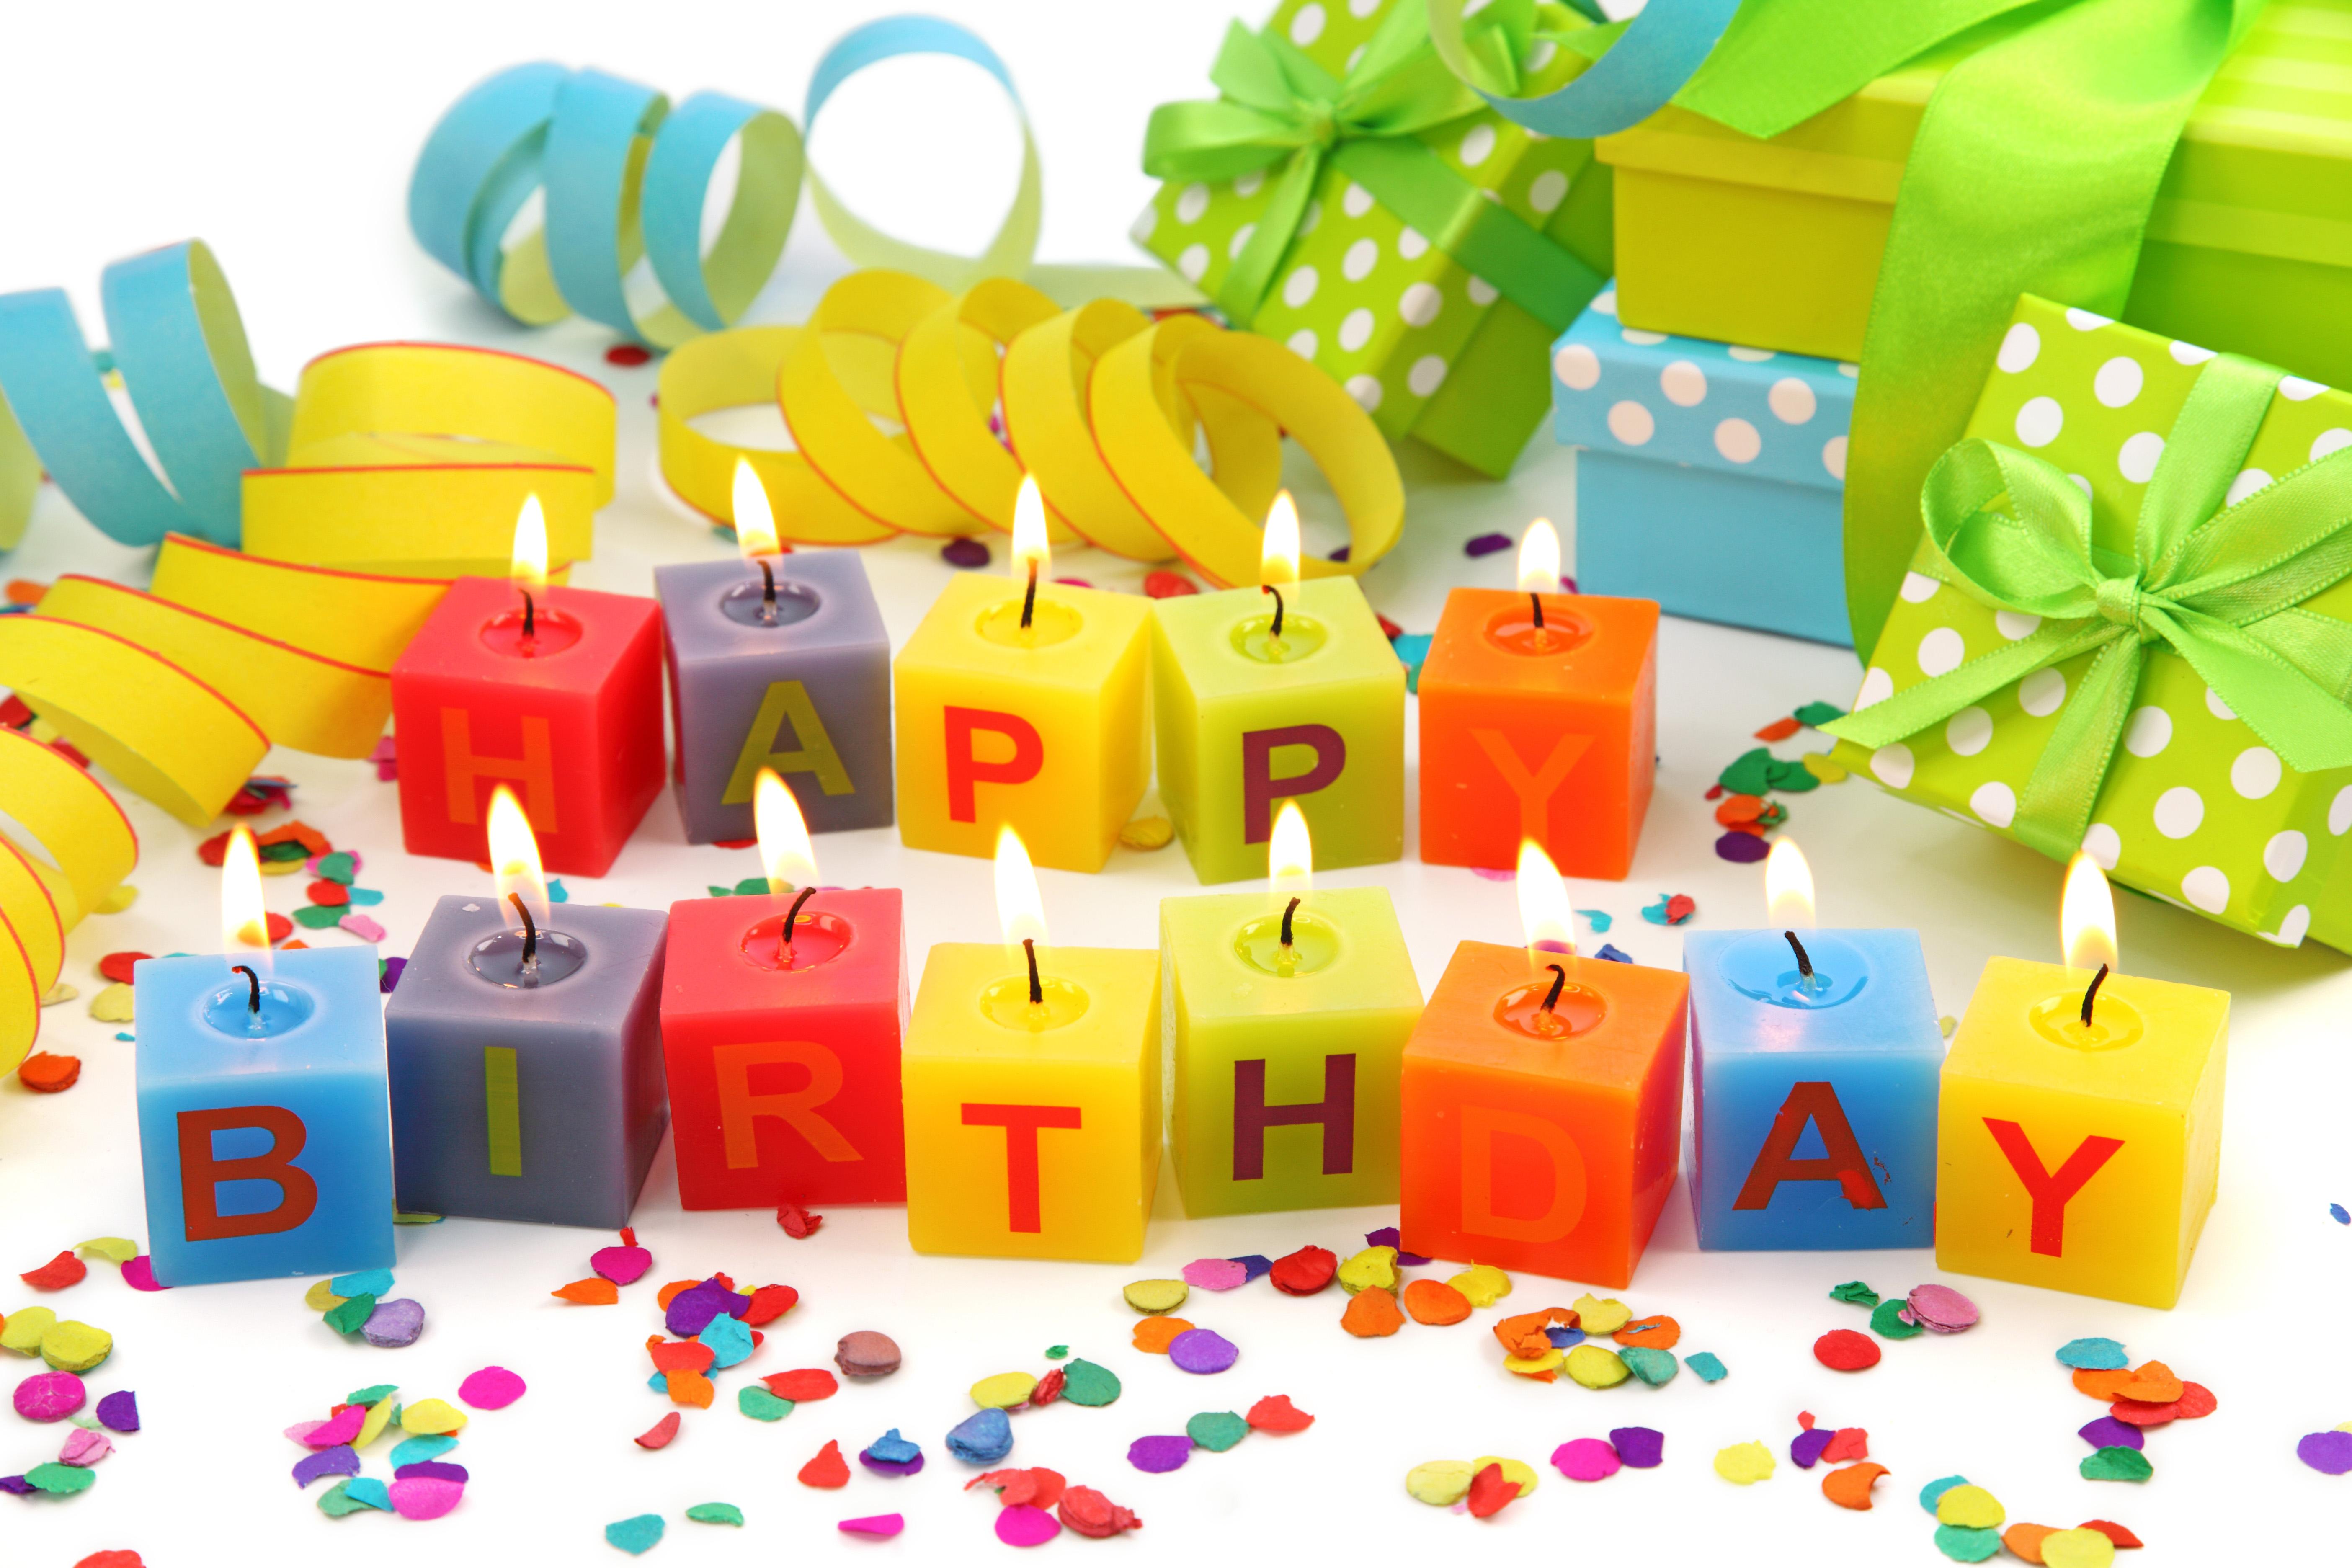 Happy Birthday Desktop Wallpaper Images amp Pictures   Becuo 5616x3744